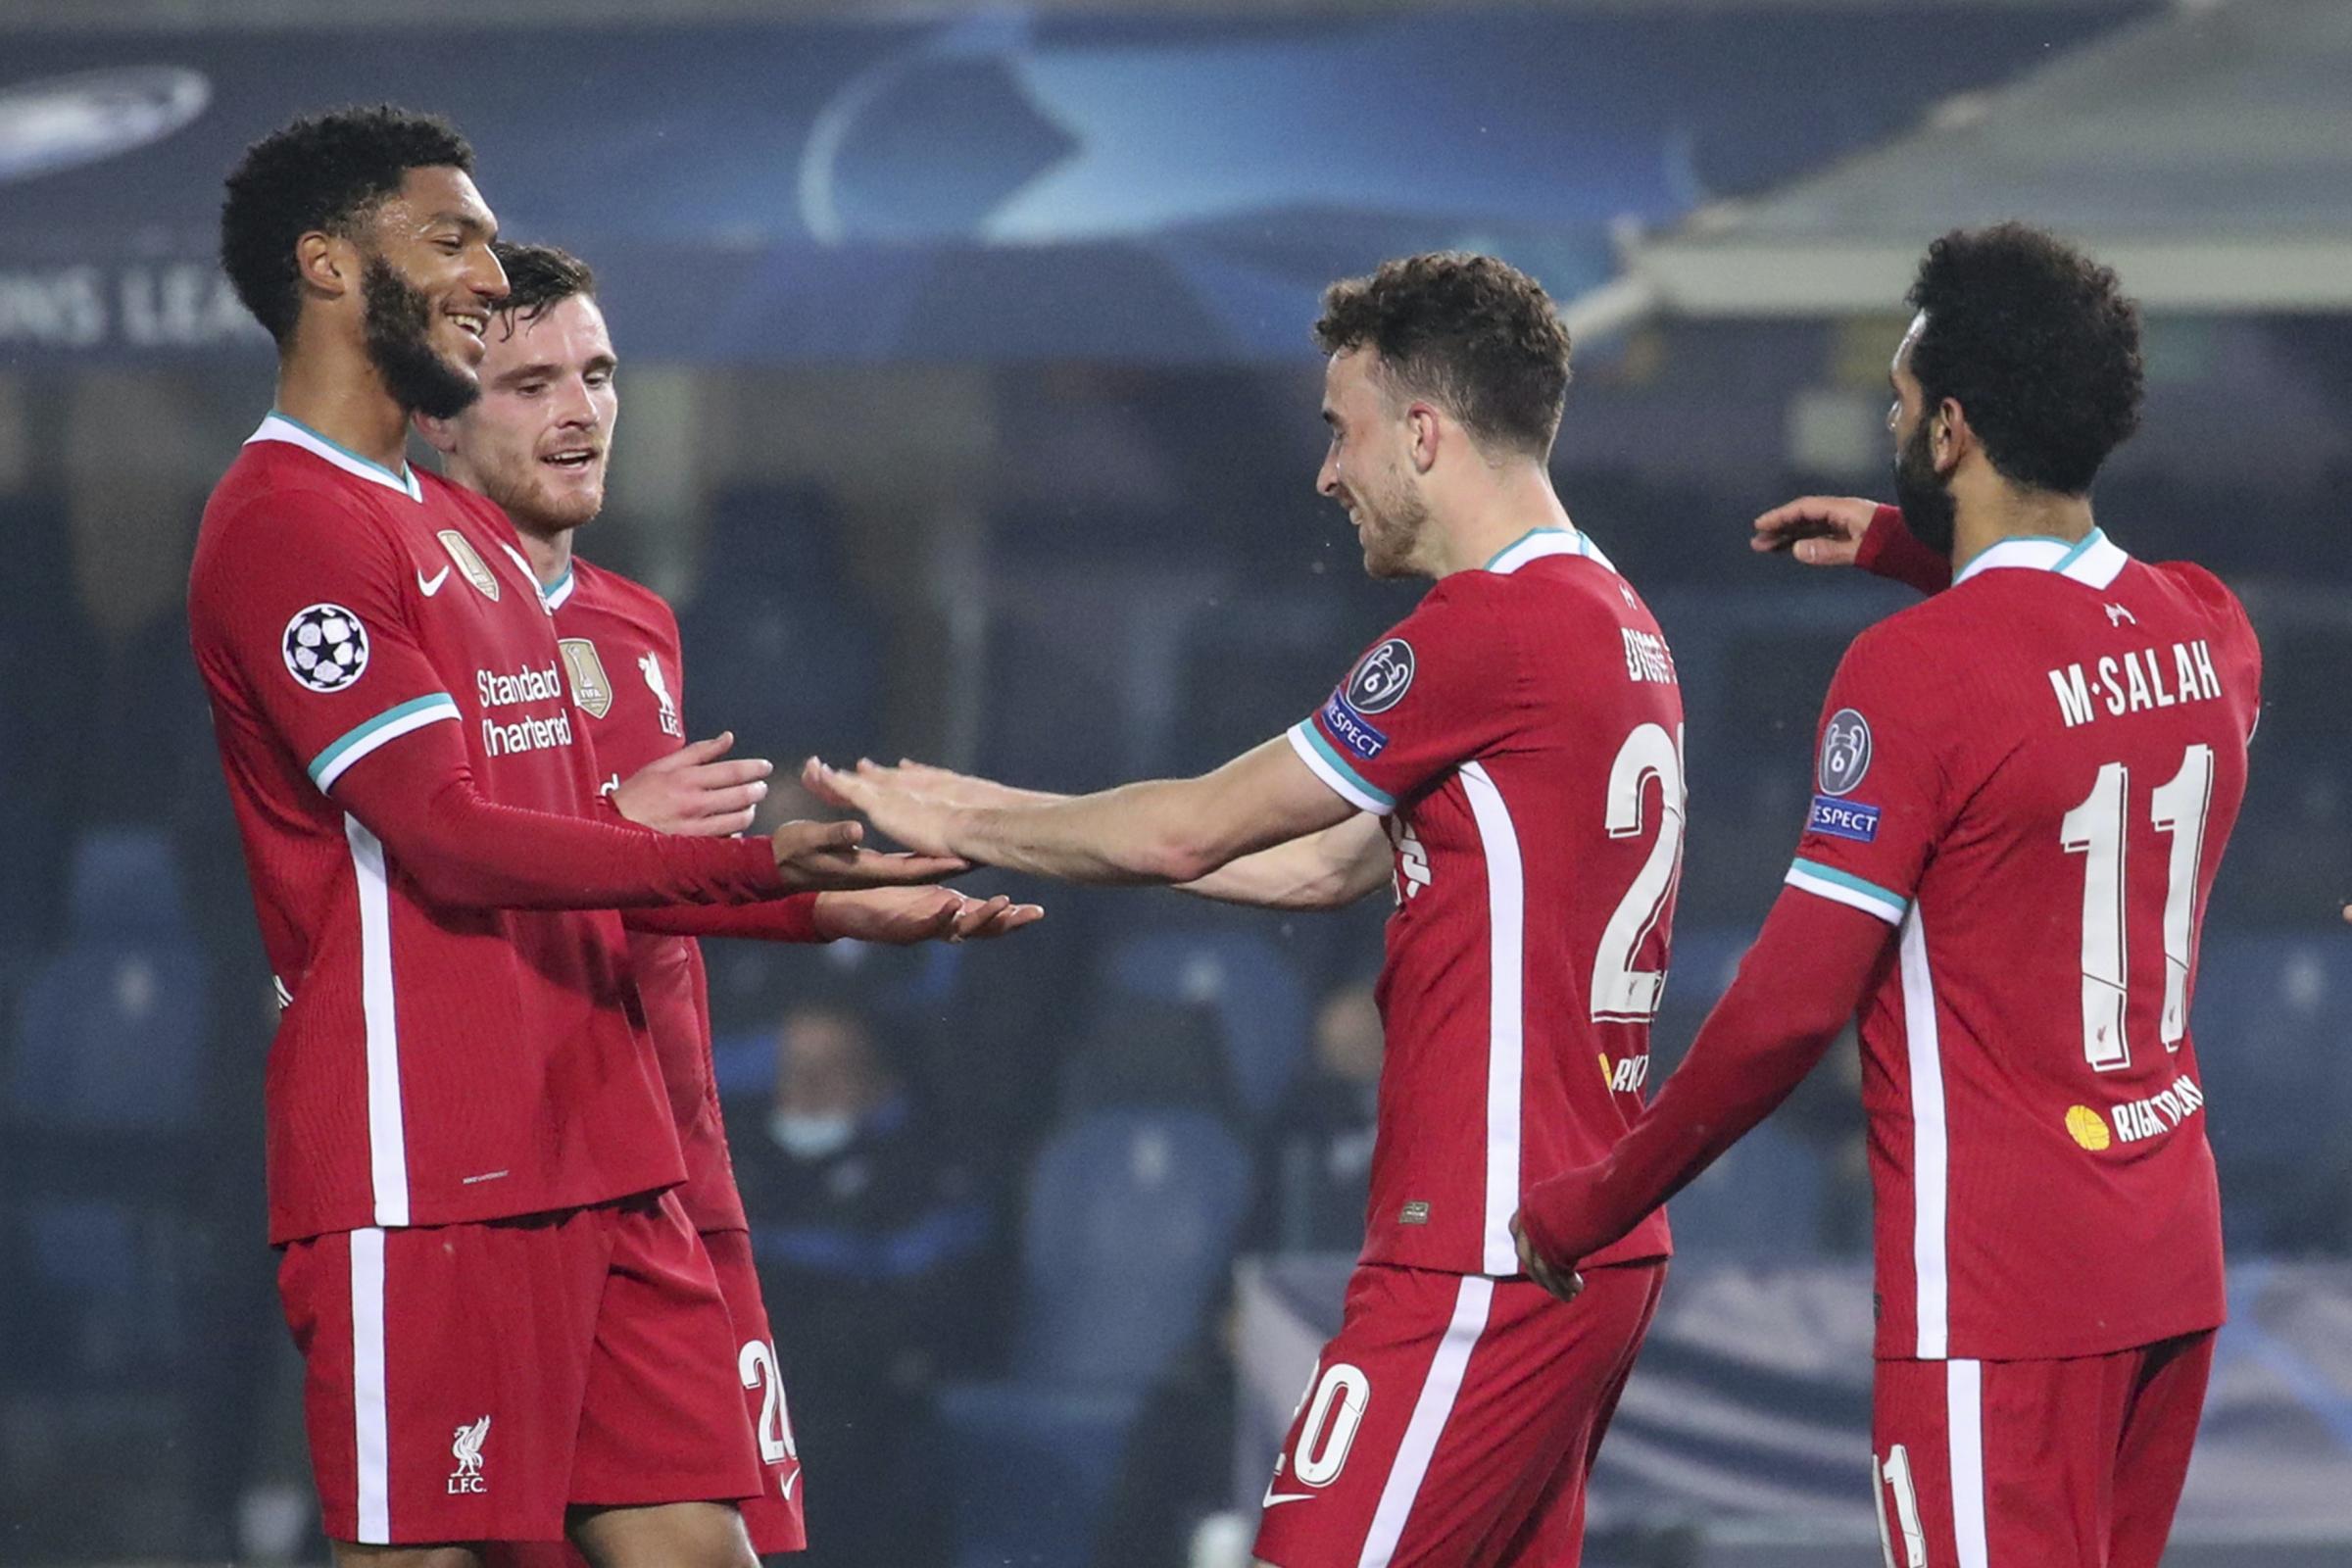 Diogo Jota repays Jurgen Klopp's faith with hat-trick as Reds roll ...